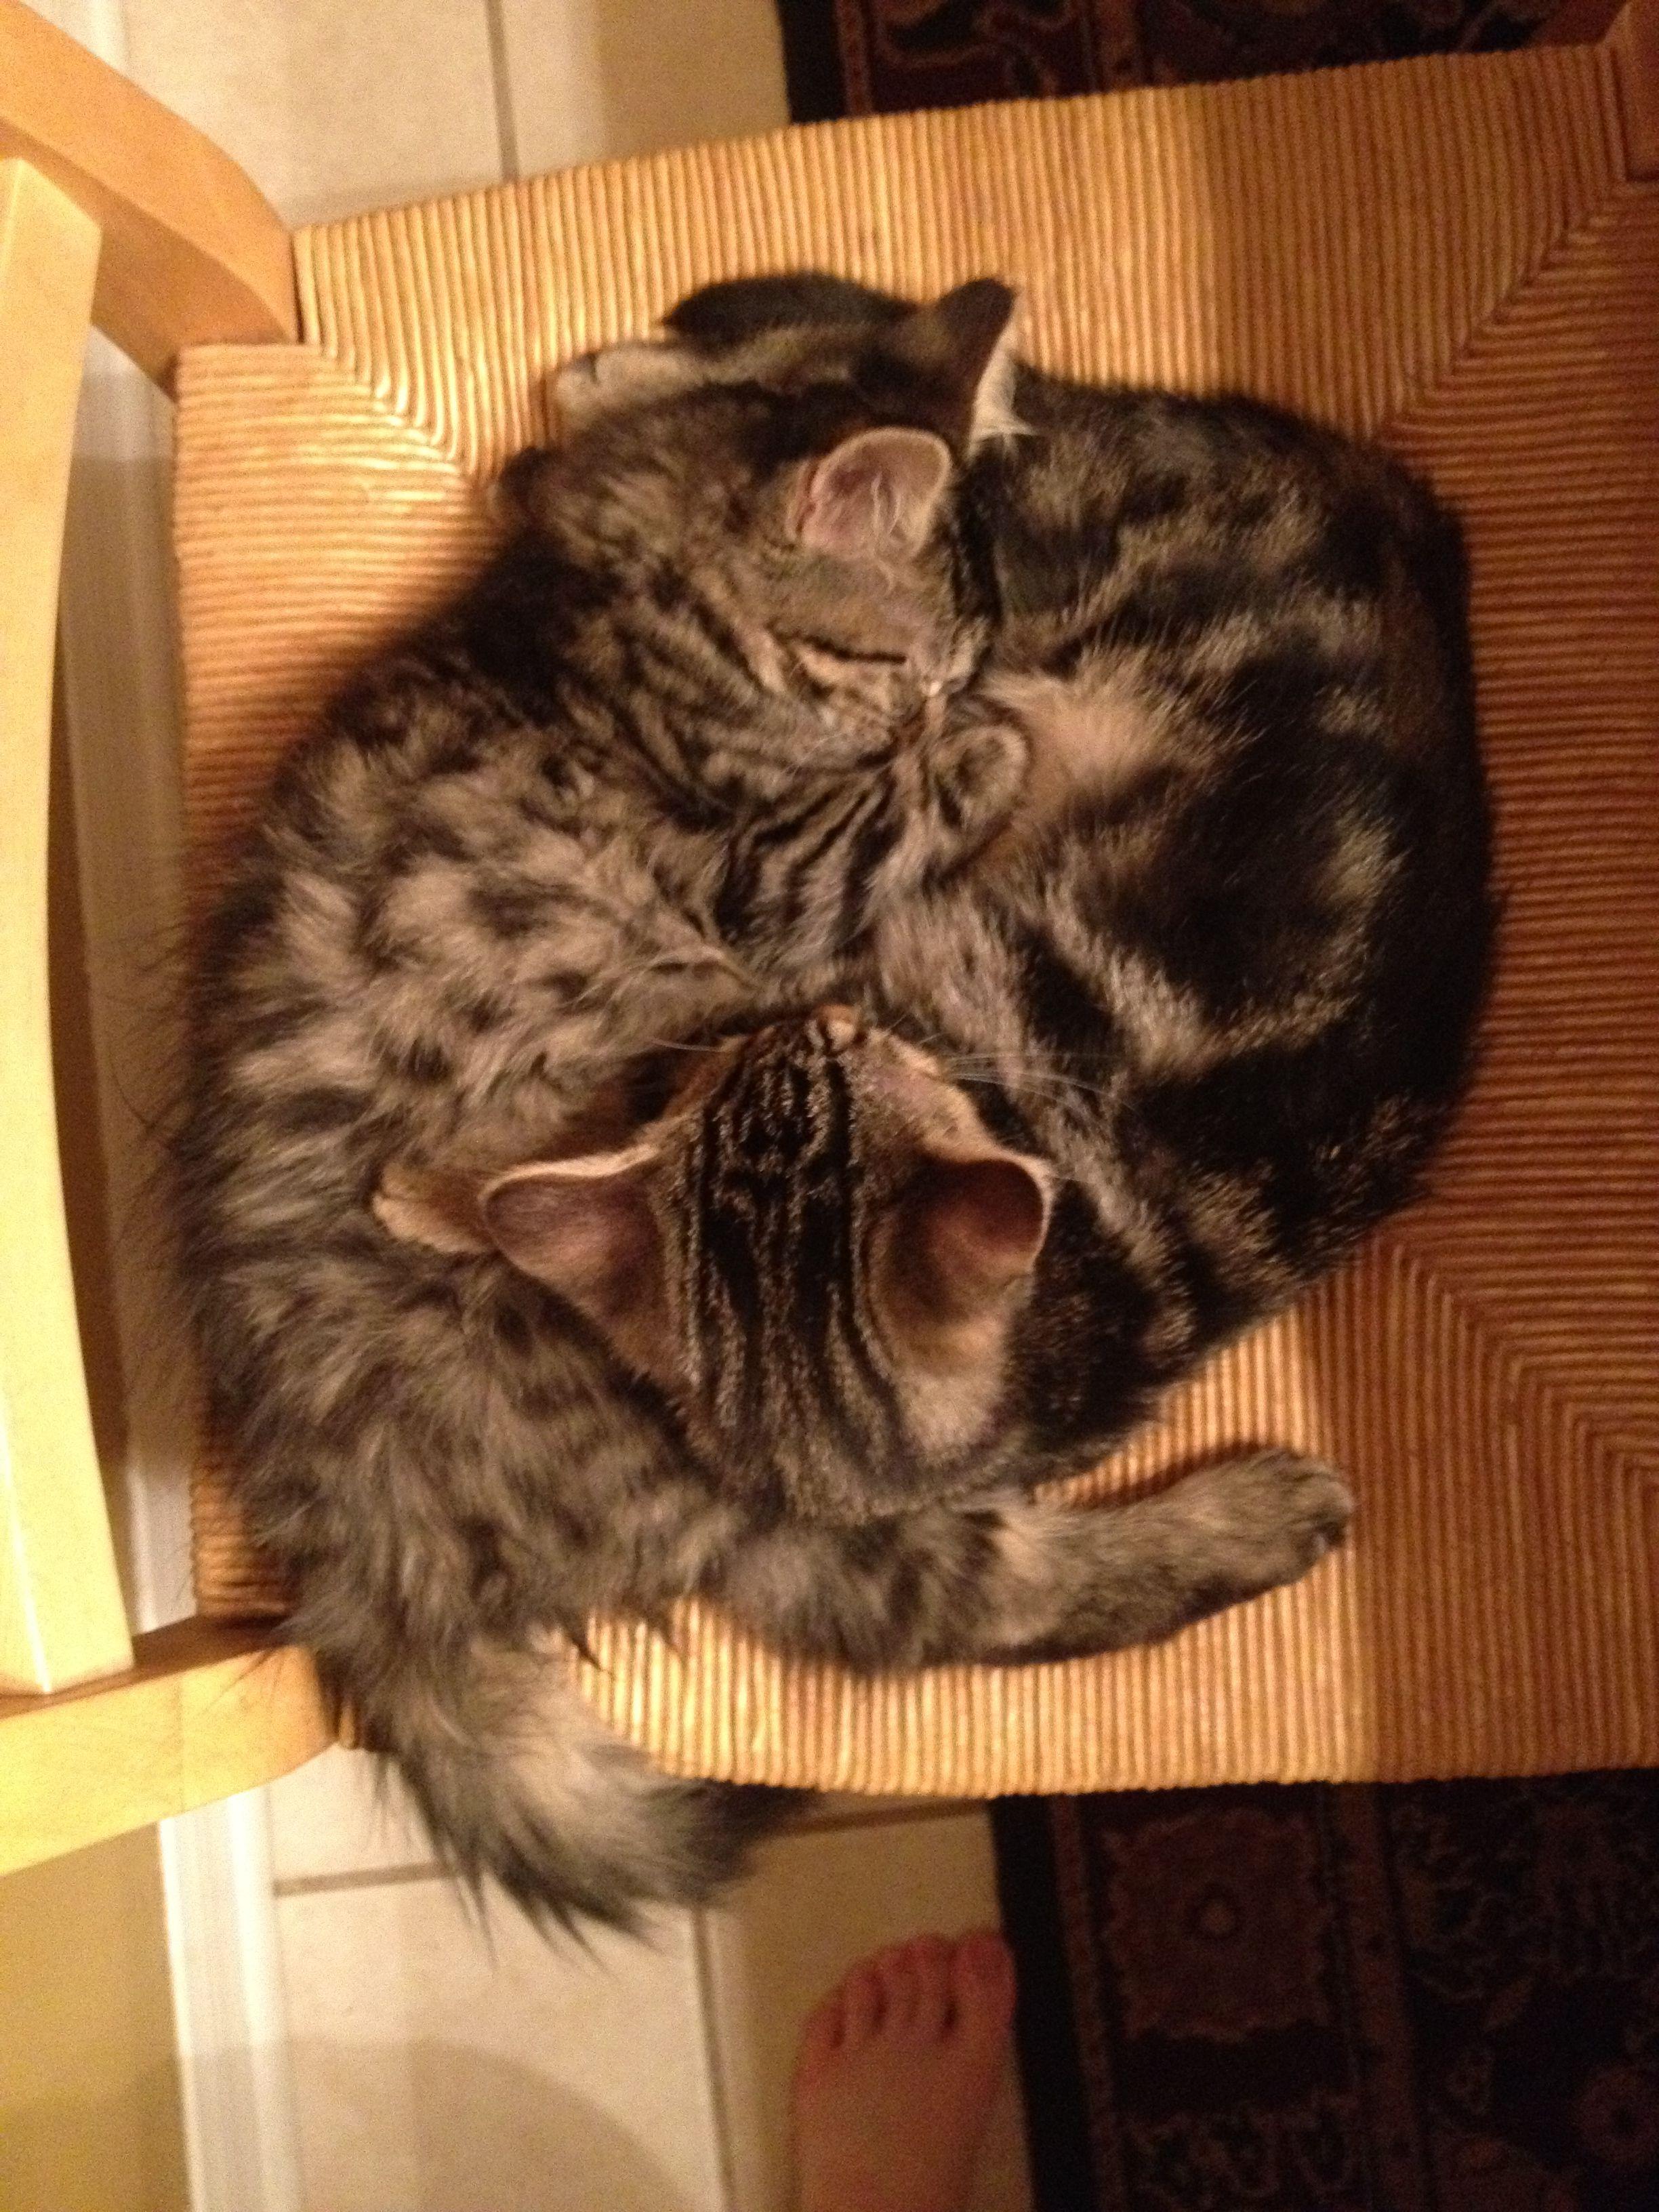 Kittens Sleeping Kitten Baby Cats Cute Little Kittens